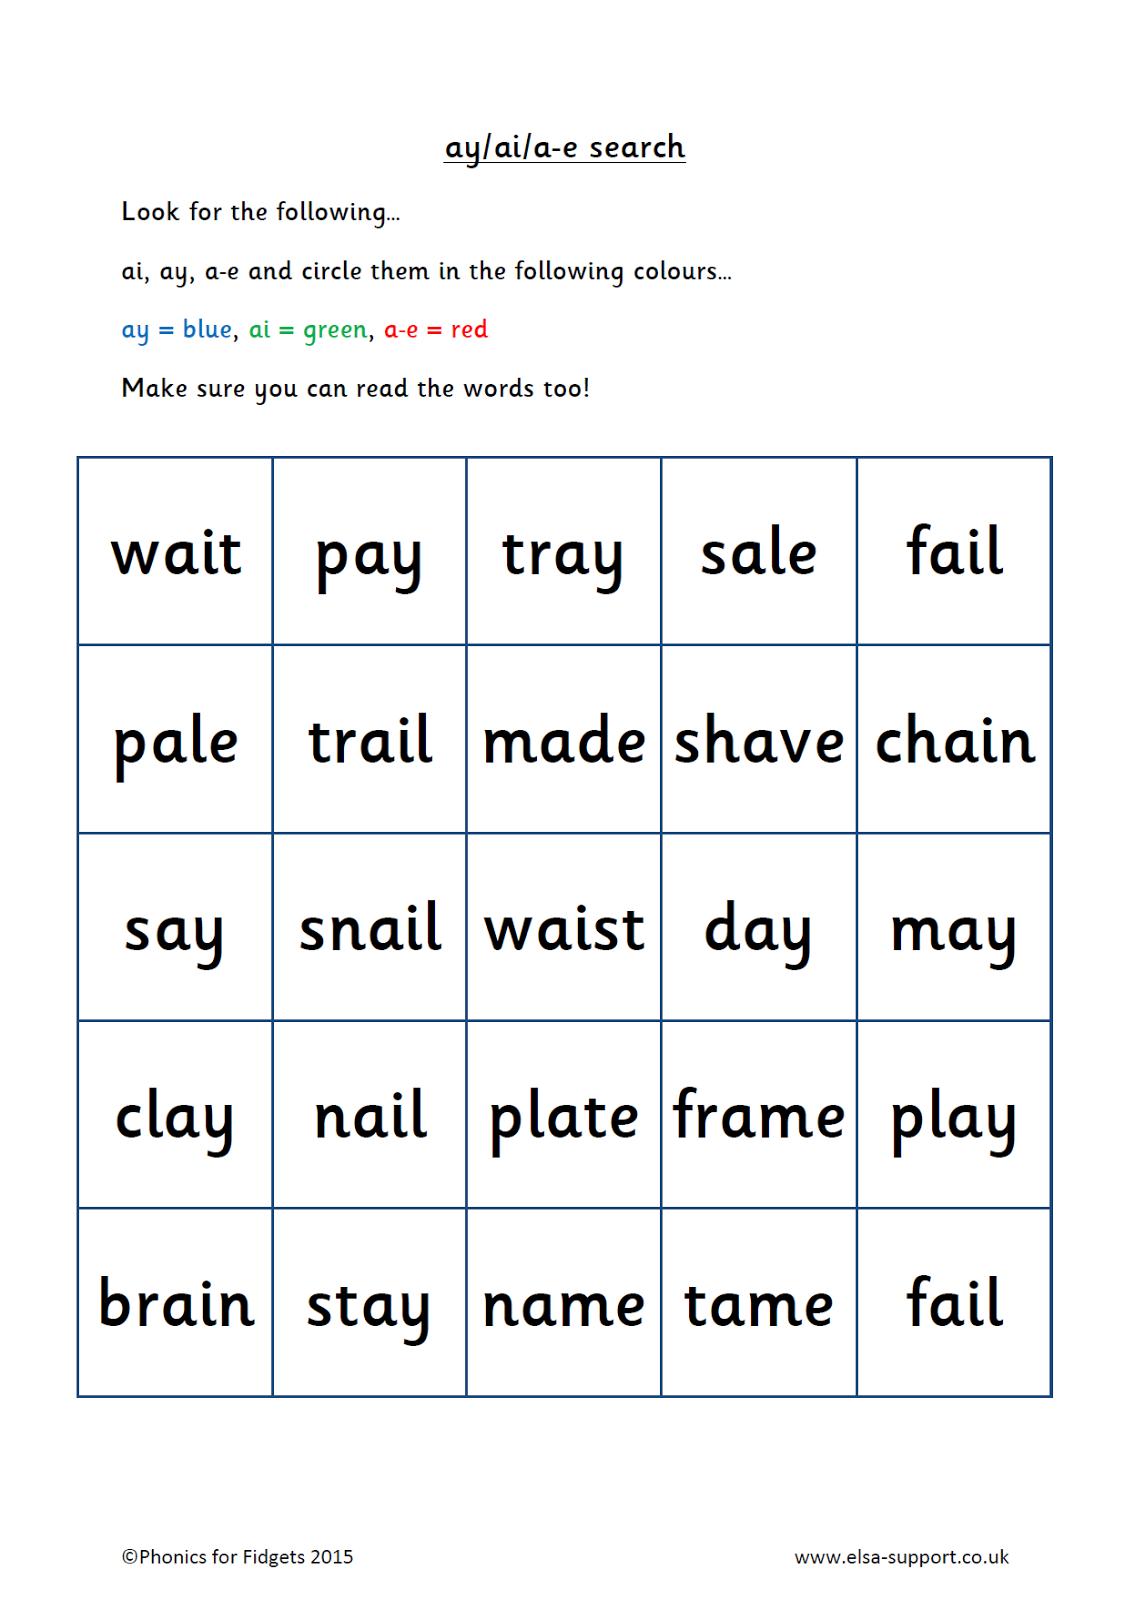 Phonics For Fidgets With Felix Recognising Vowel Digraphs